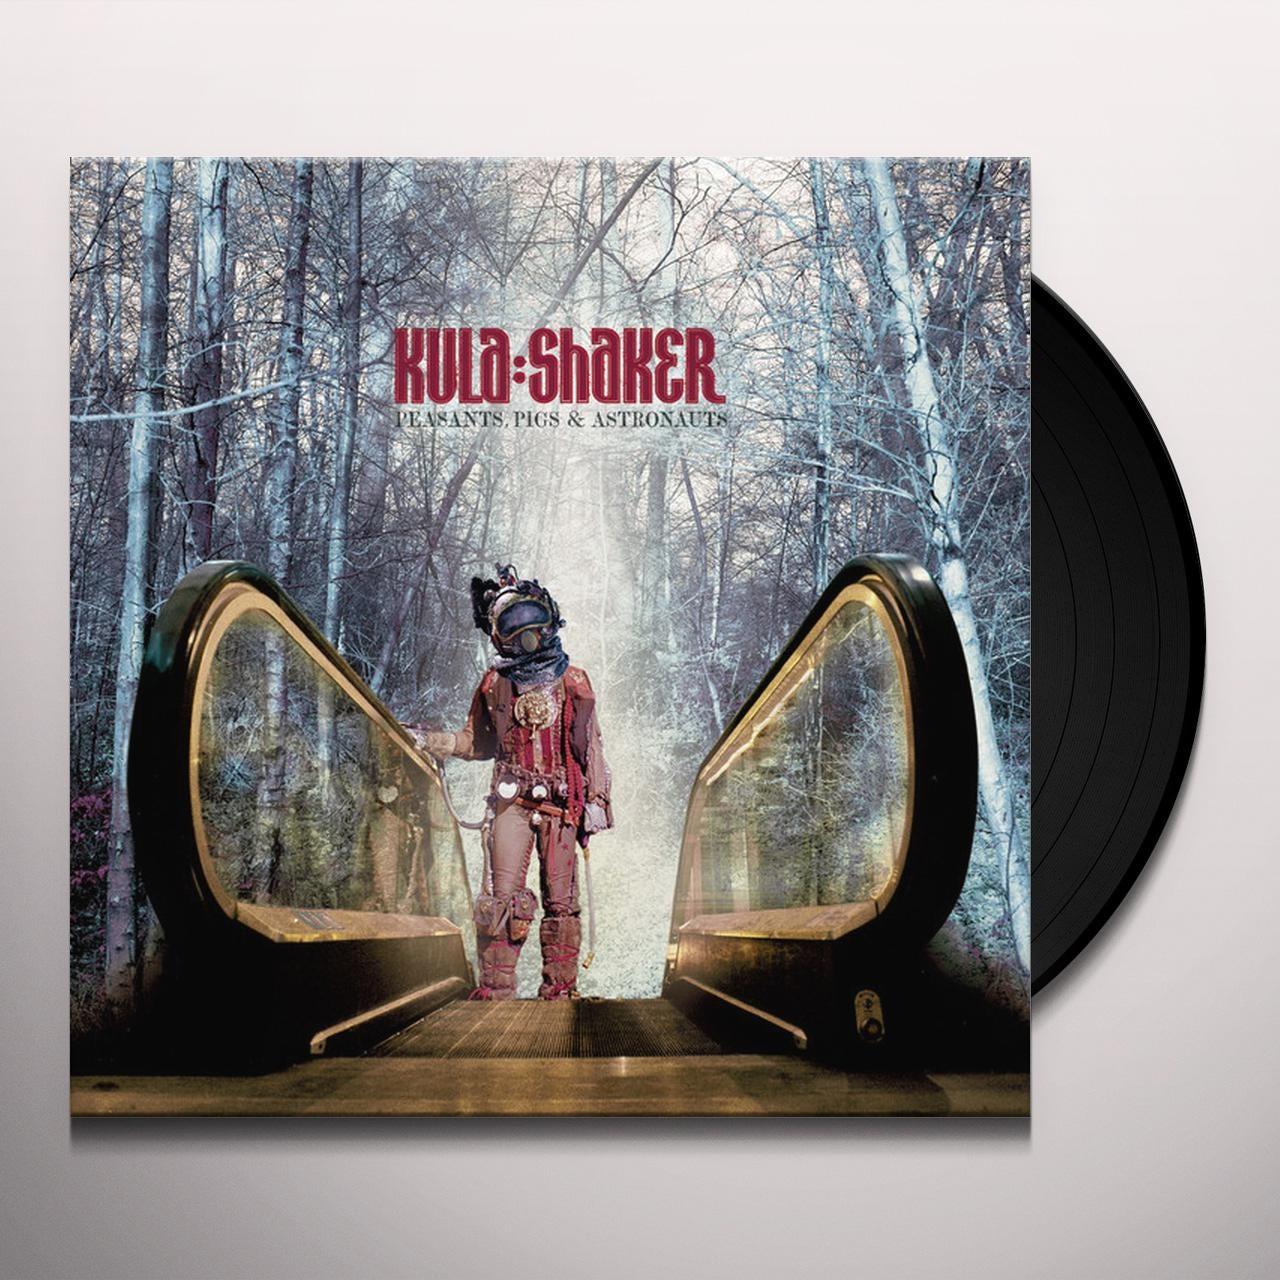 Kula Shaker Peasants Pigs Astronauts Vinyl Record